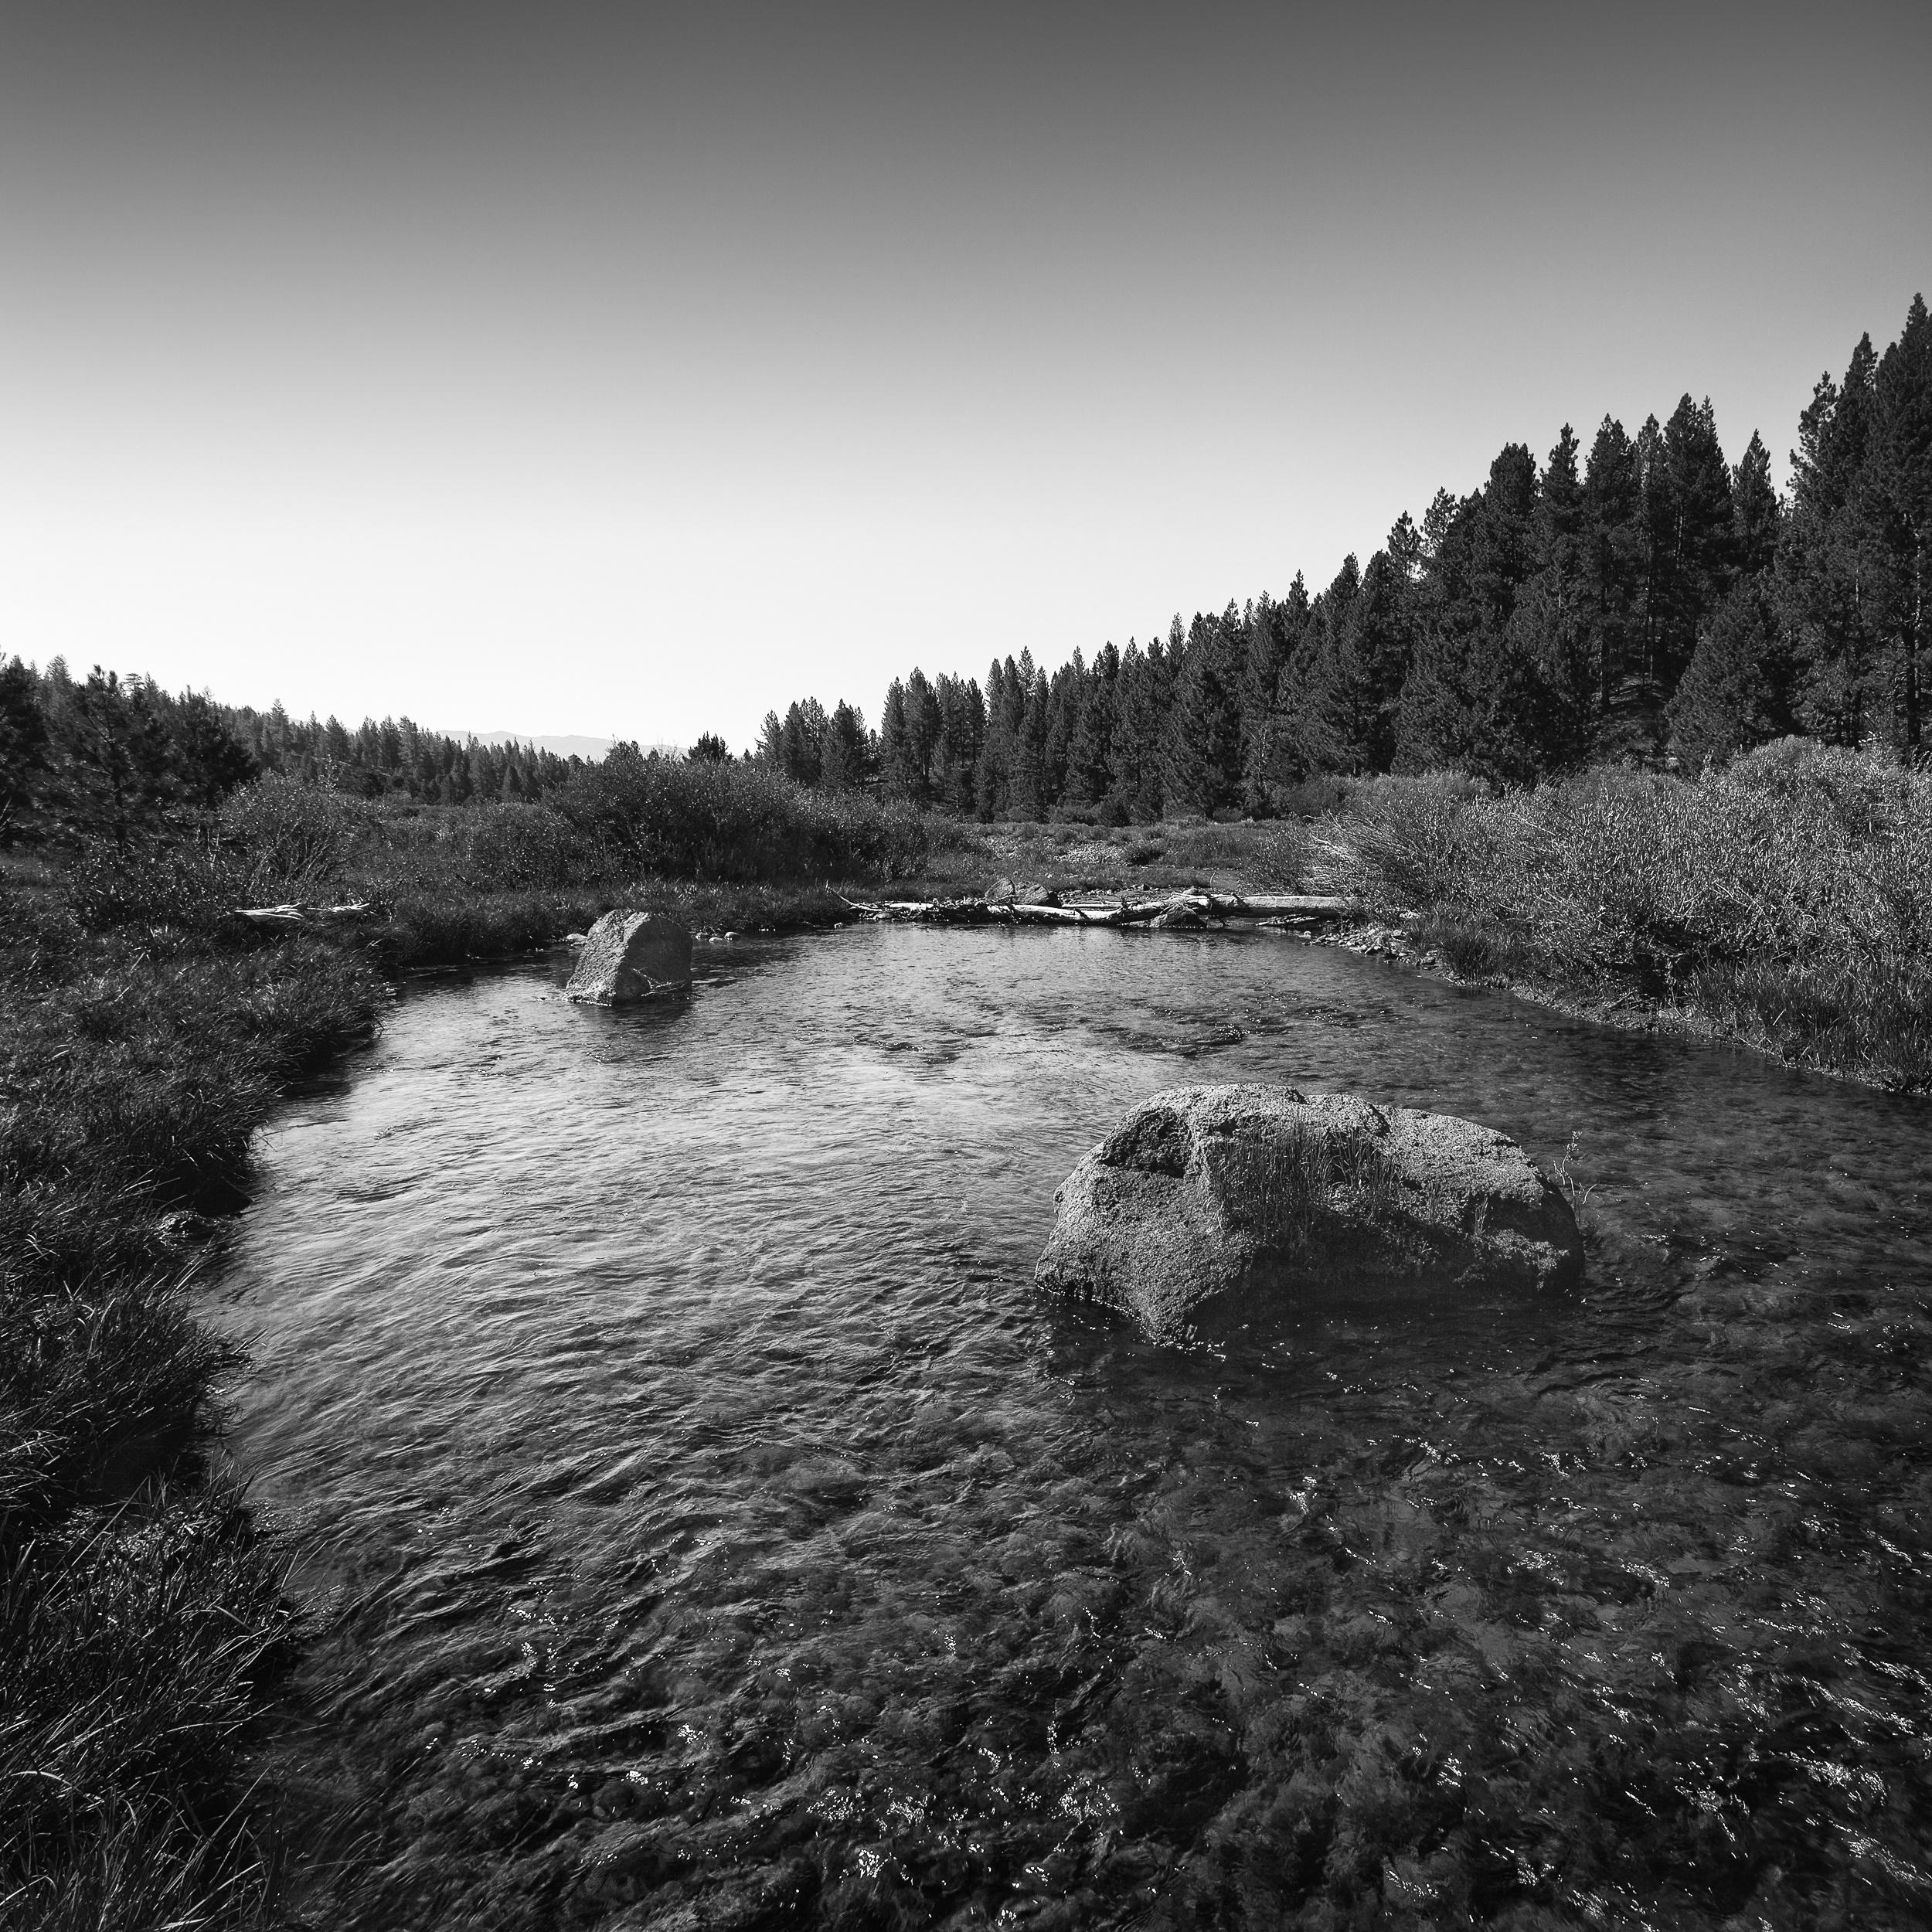 Run, Little Truckee River